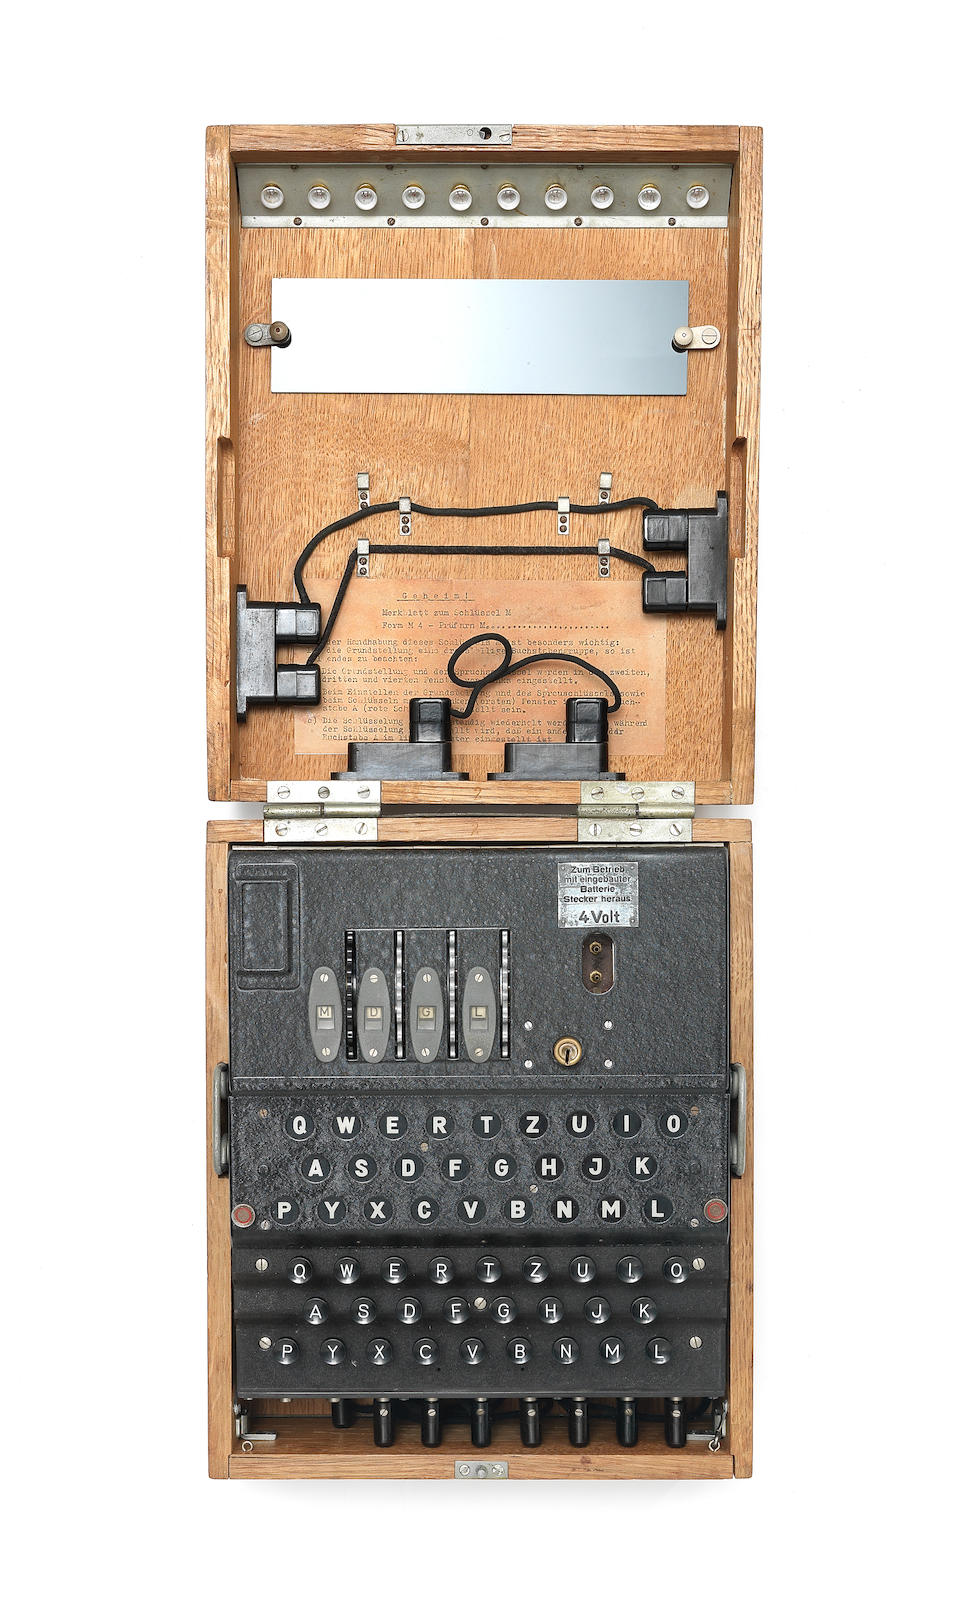 A German Naval 4-rotor Enigma enciphering machine (M4), for U-Boat use, circa 1942-44.